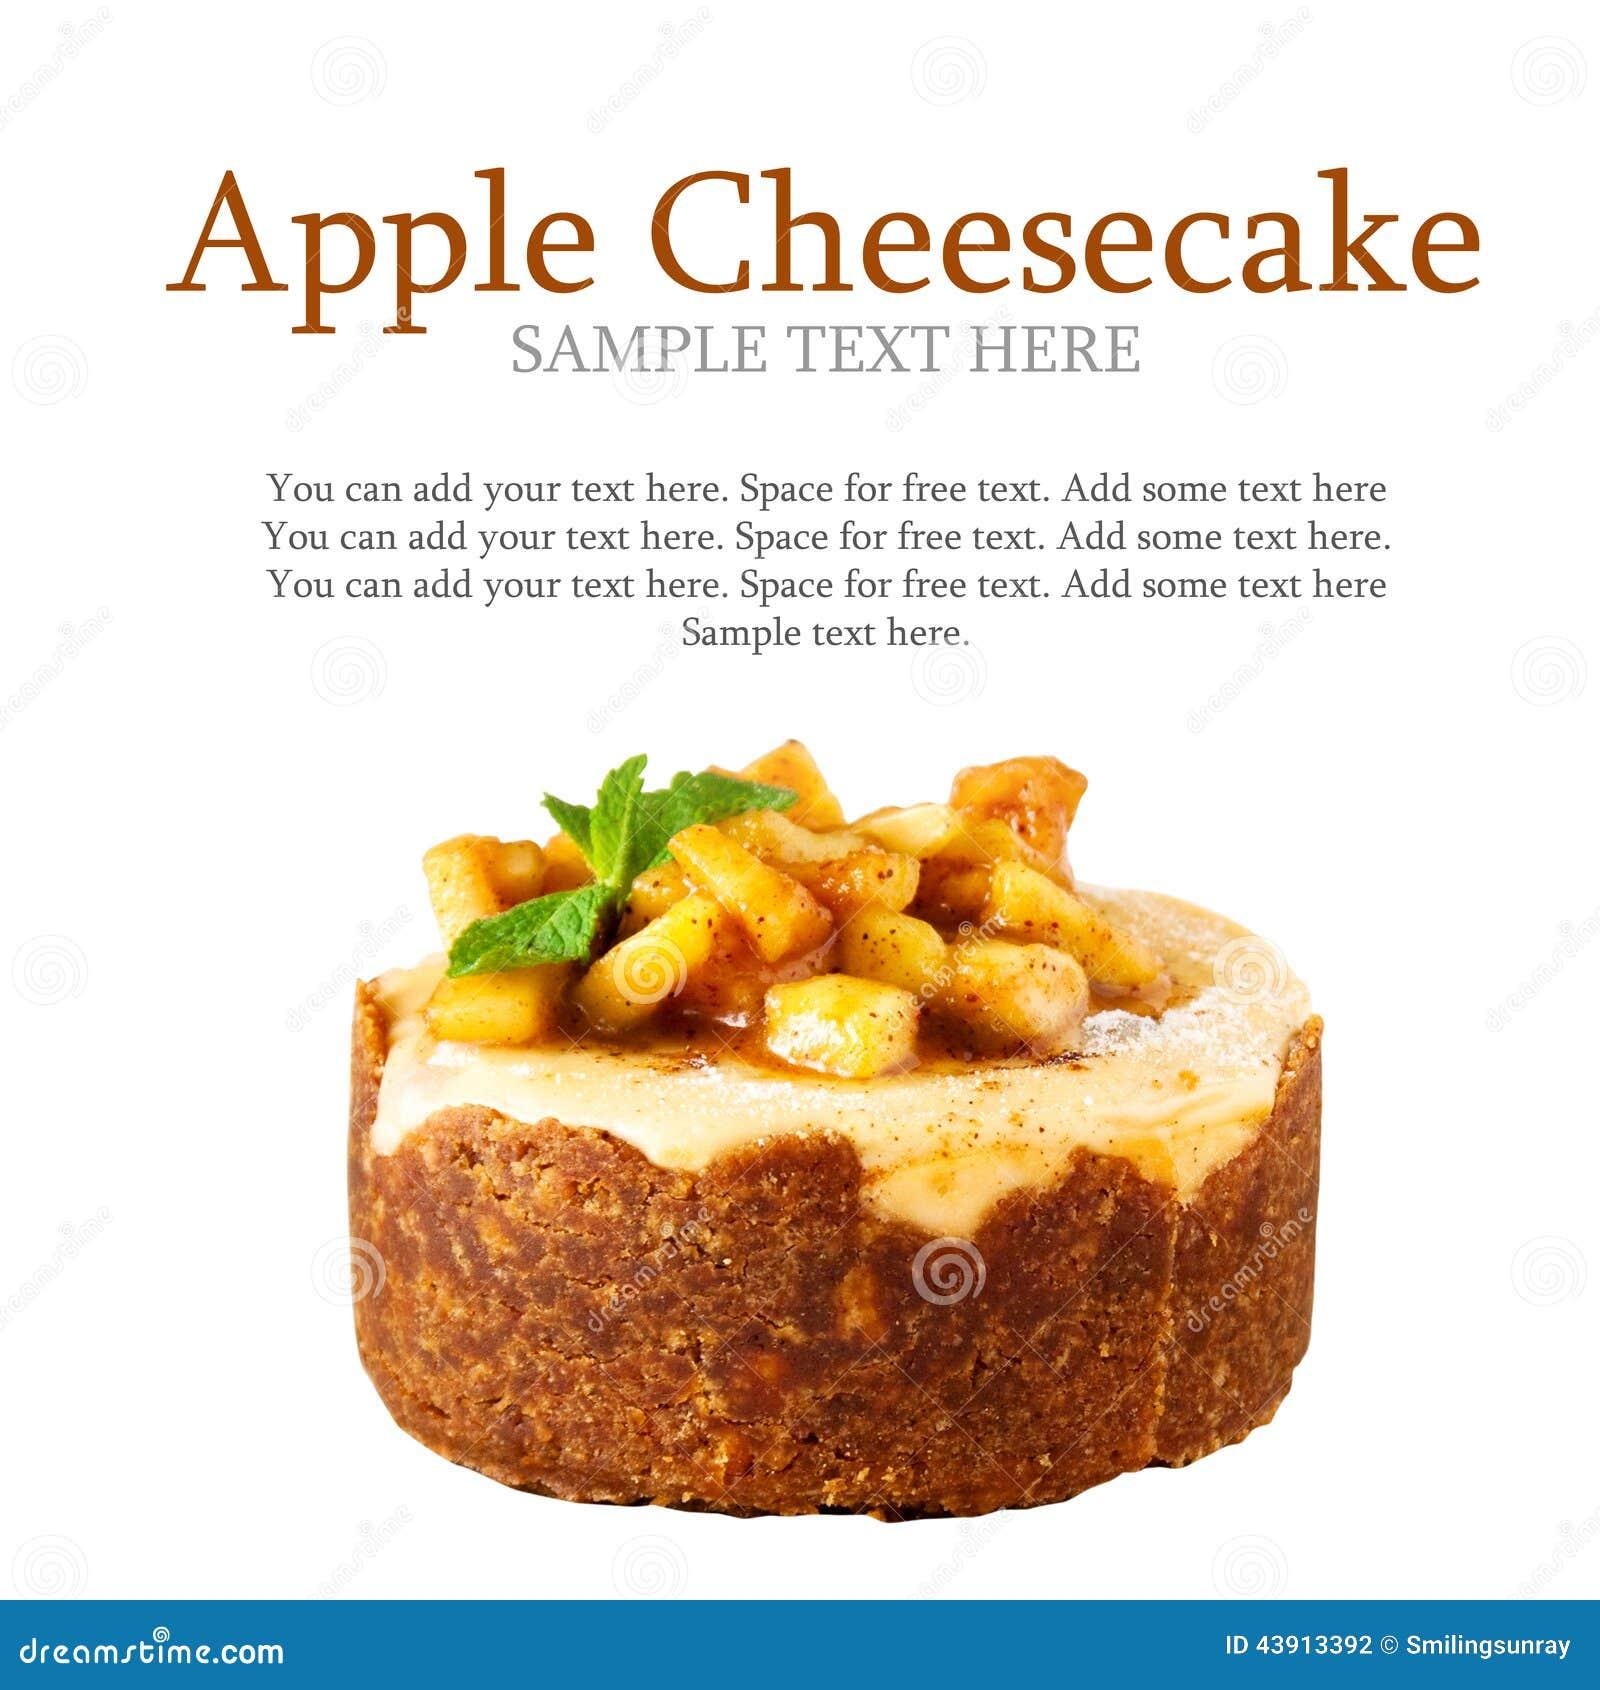 Food Advertisment Stock Photo - Image: 43913392